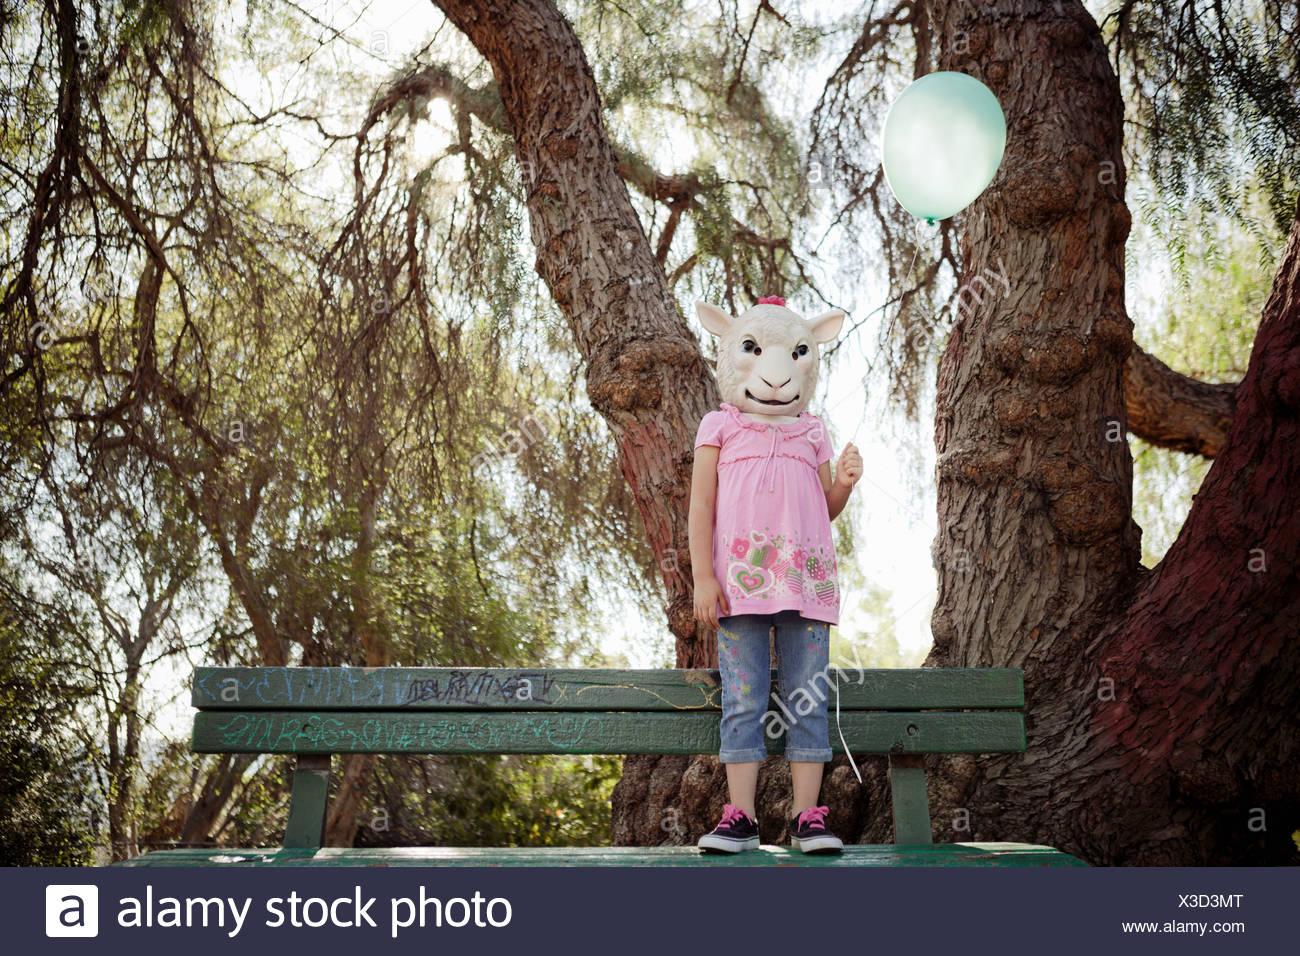 Bambino in costume di pecora maschera di testa Immagini Stock